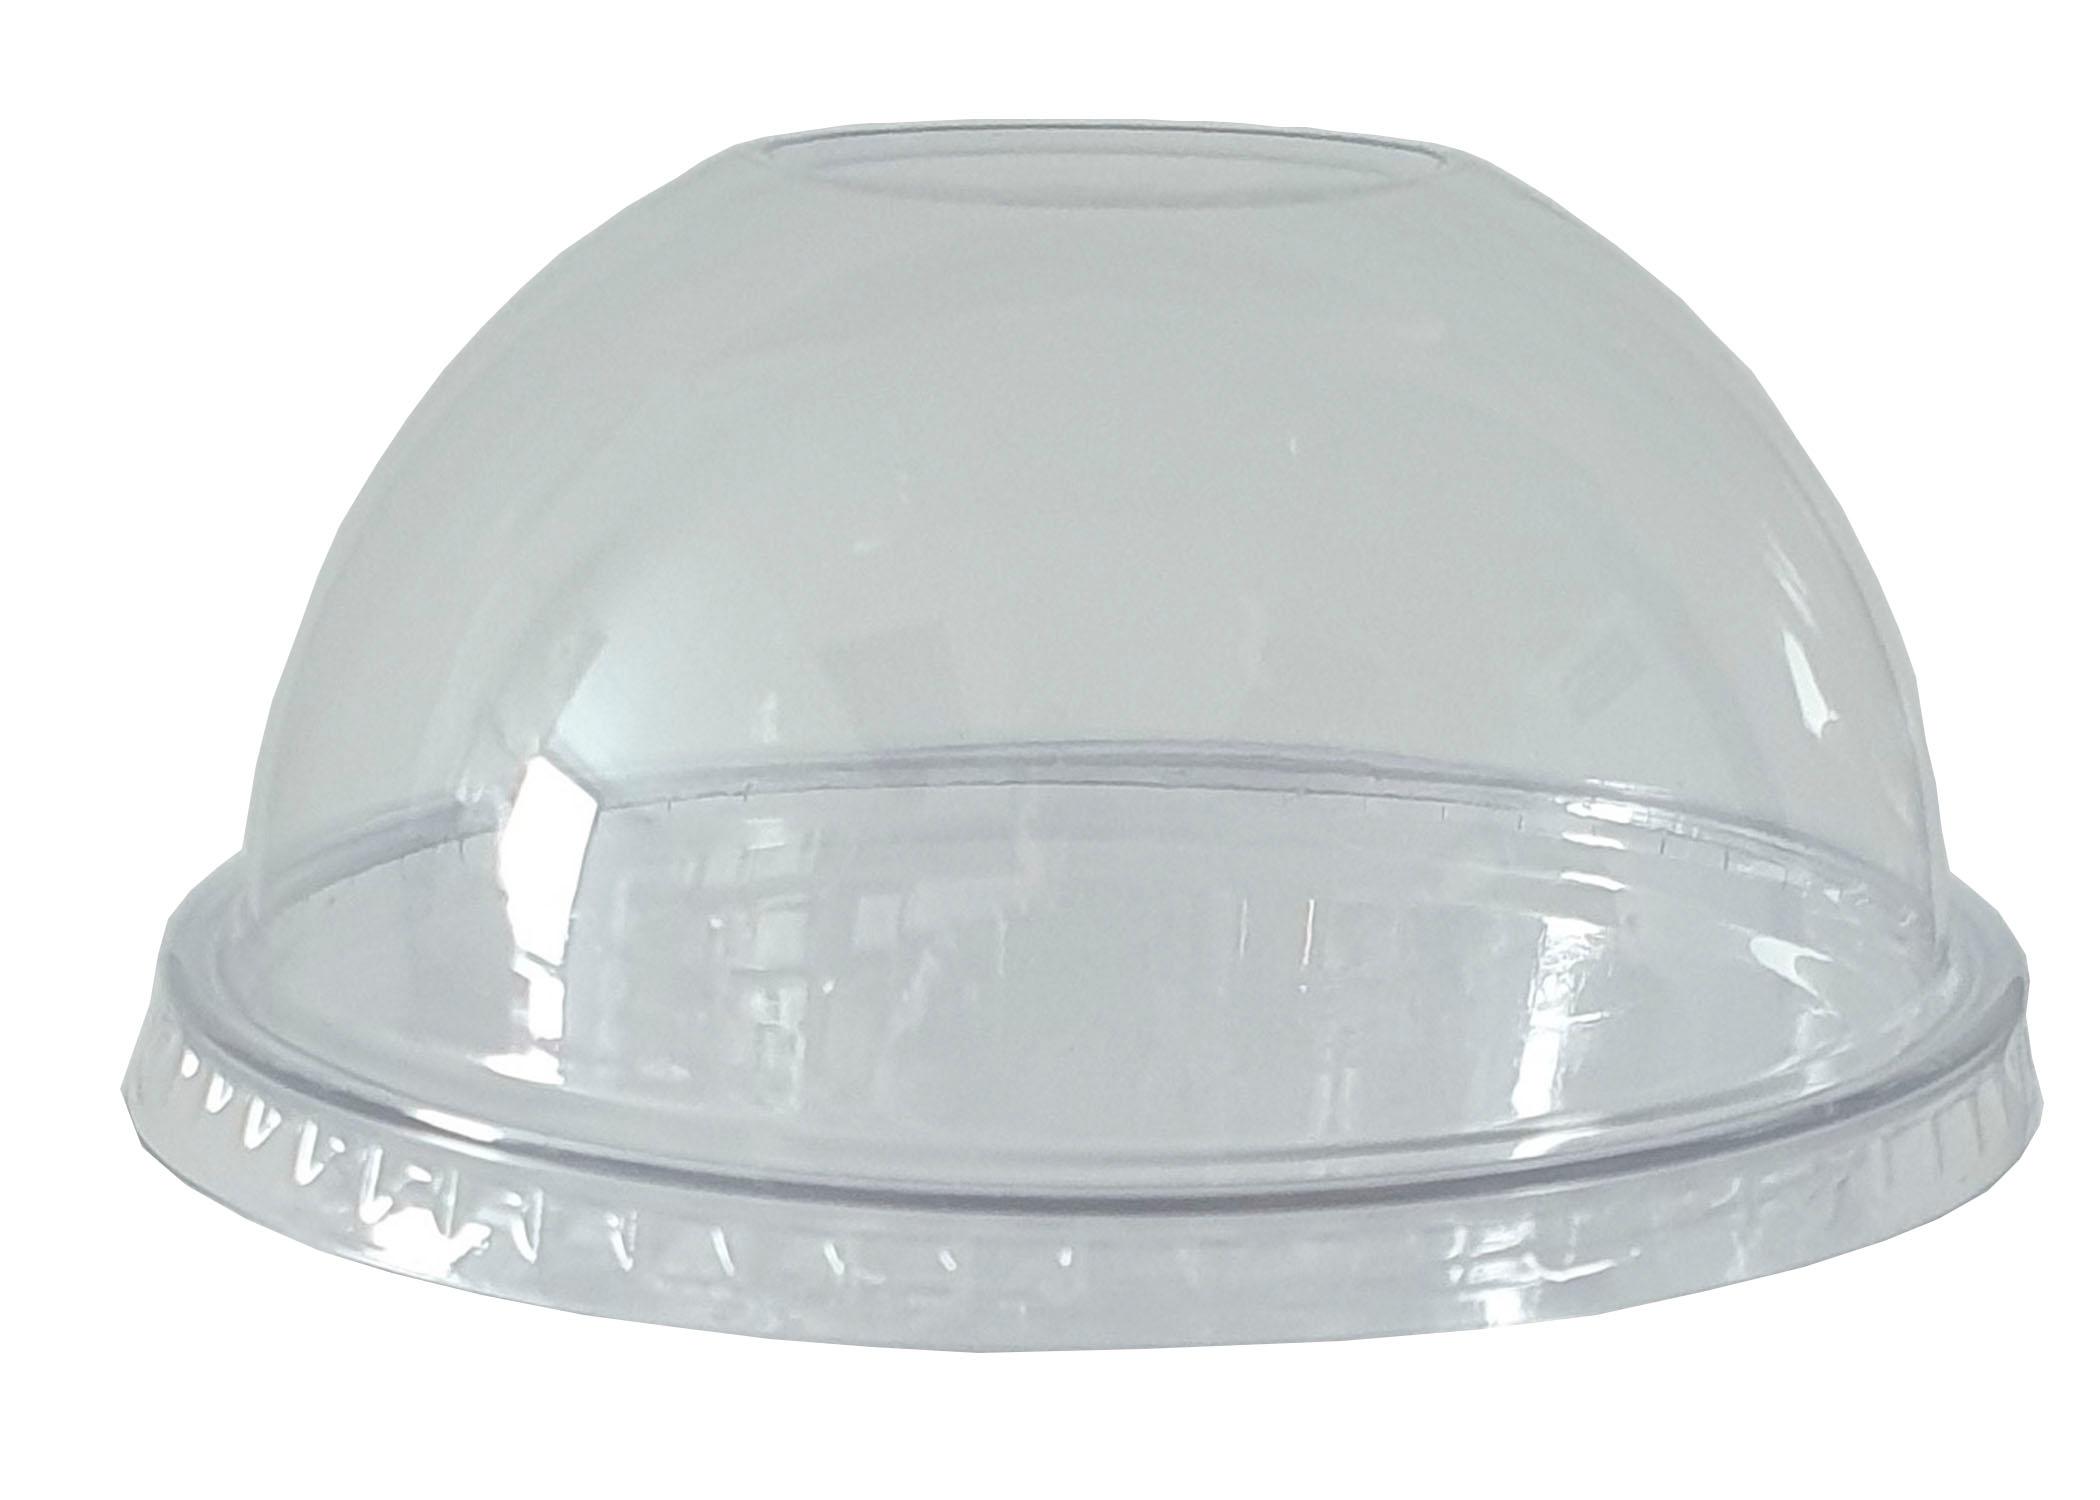 Tapa cúpula abierta D95